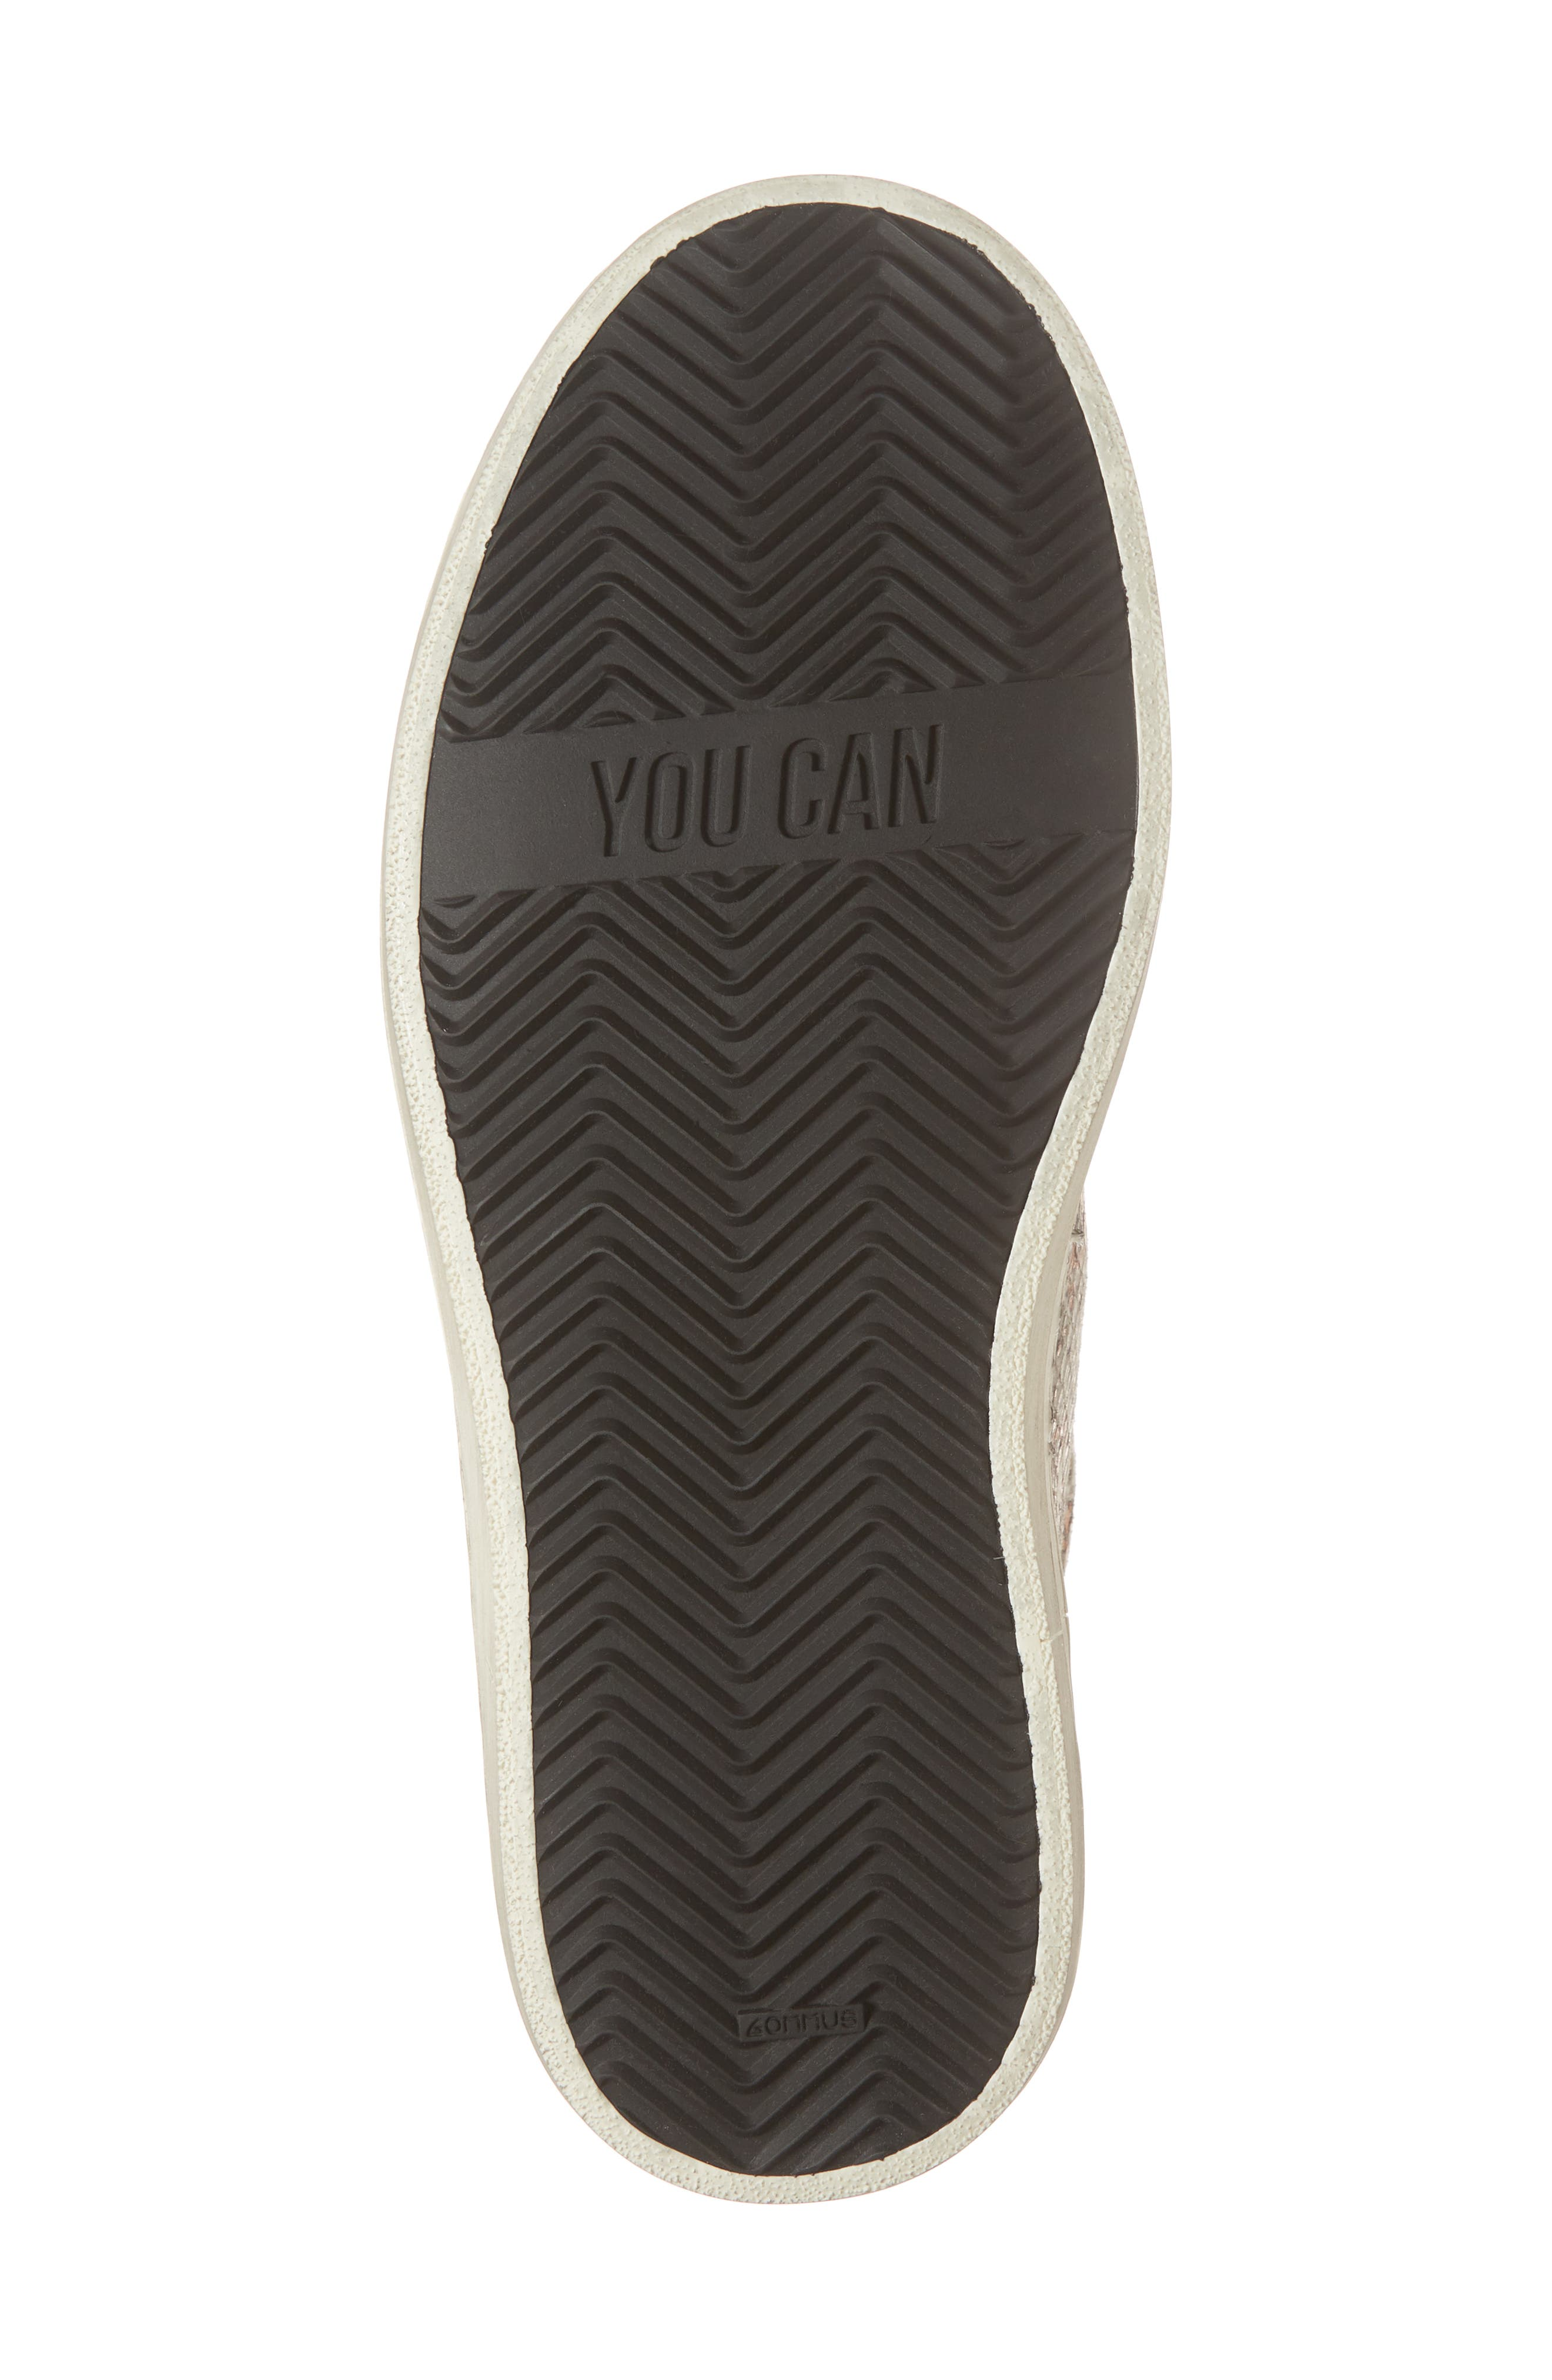 Skate High Top Sneaker,                             Alternate thumbnail 6, color,                             Jacobs Print